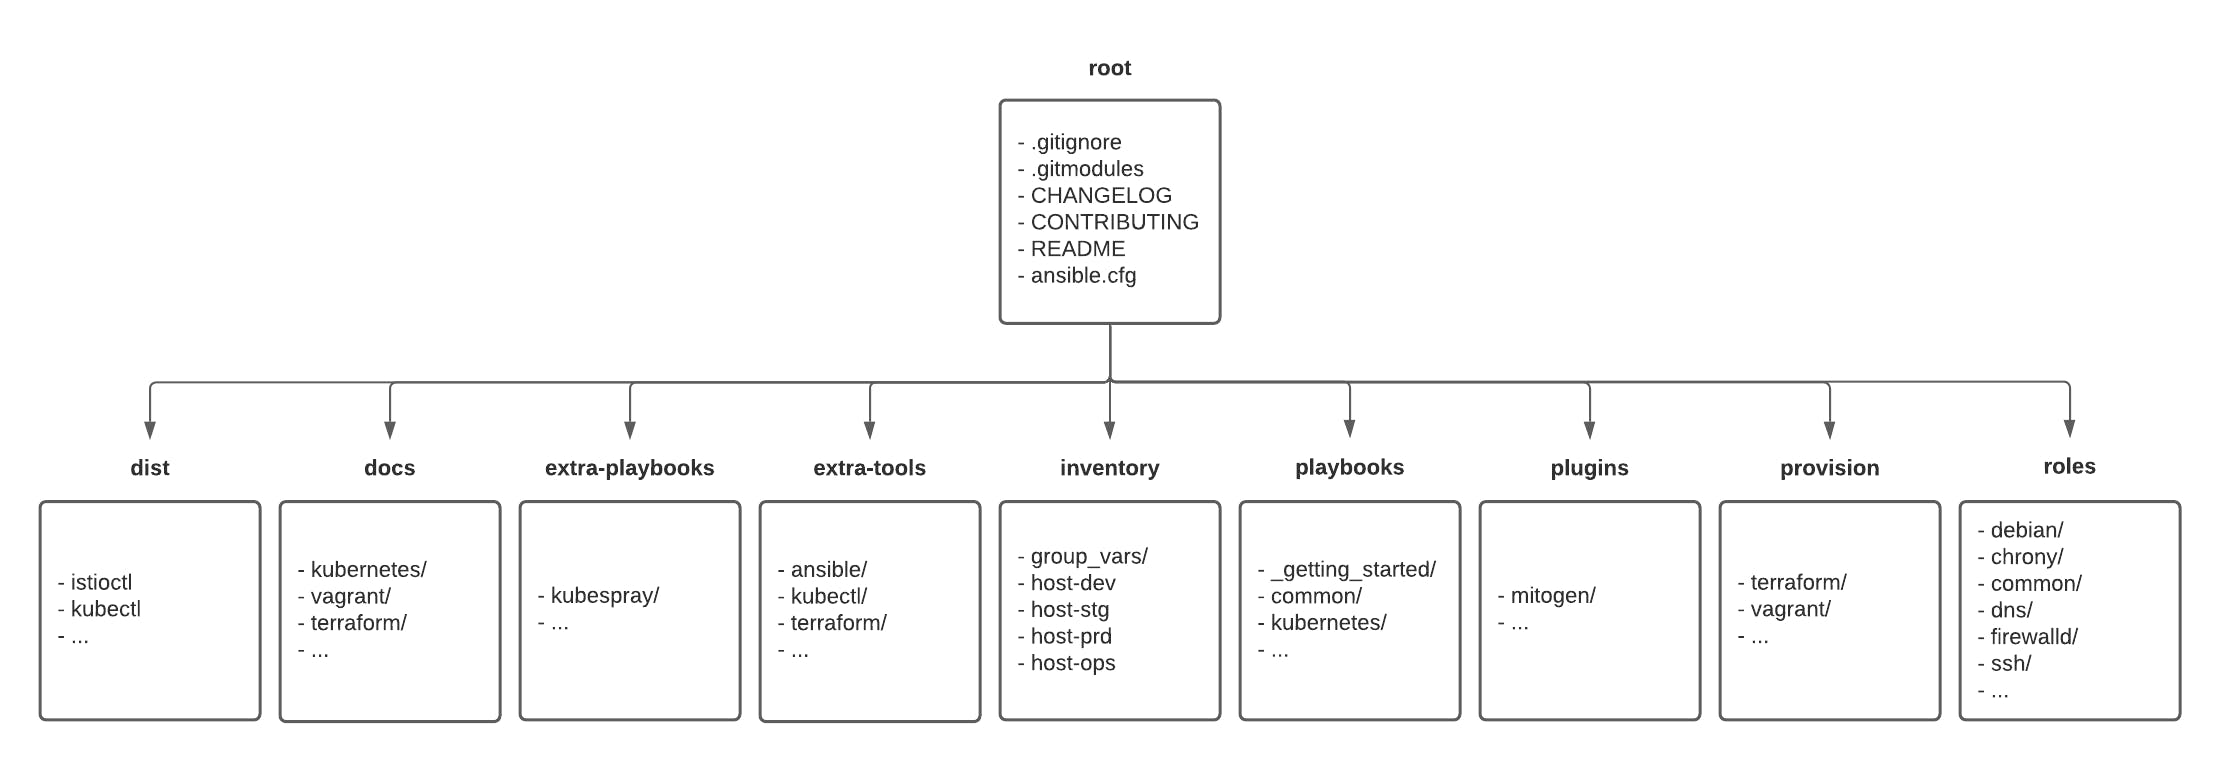 IaC_Architecture.png